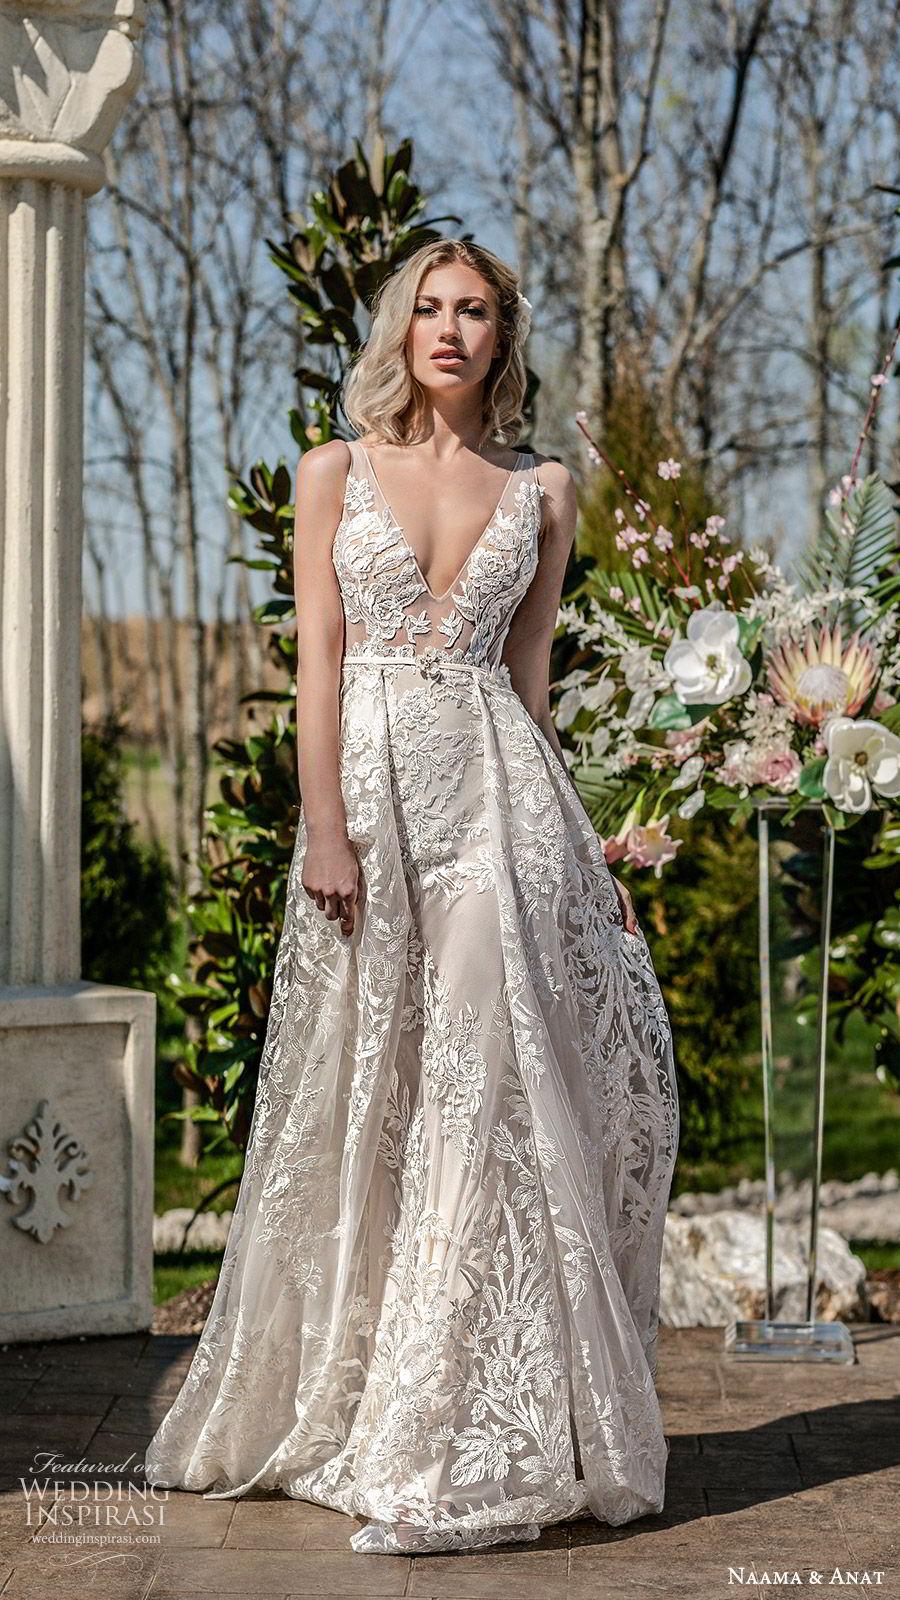 naama anat spring 2020 bridal sleeveless sheer straps deep v neckline illusion bodice fully embellished lace a line ball gown wedding dress (5) low back chapel train princess romantic mv